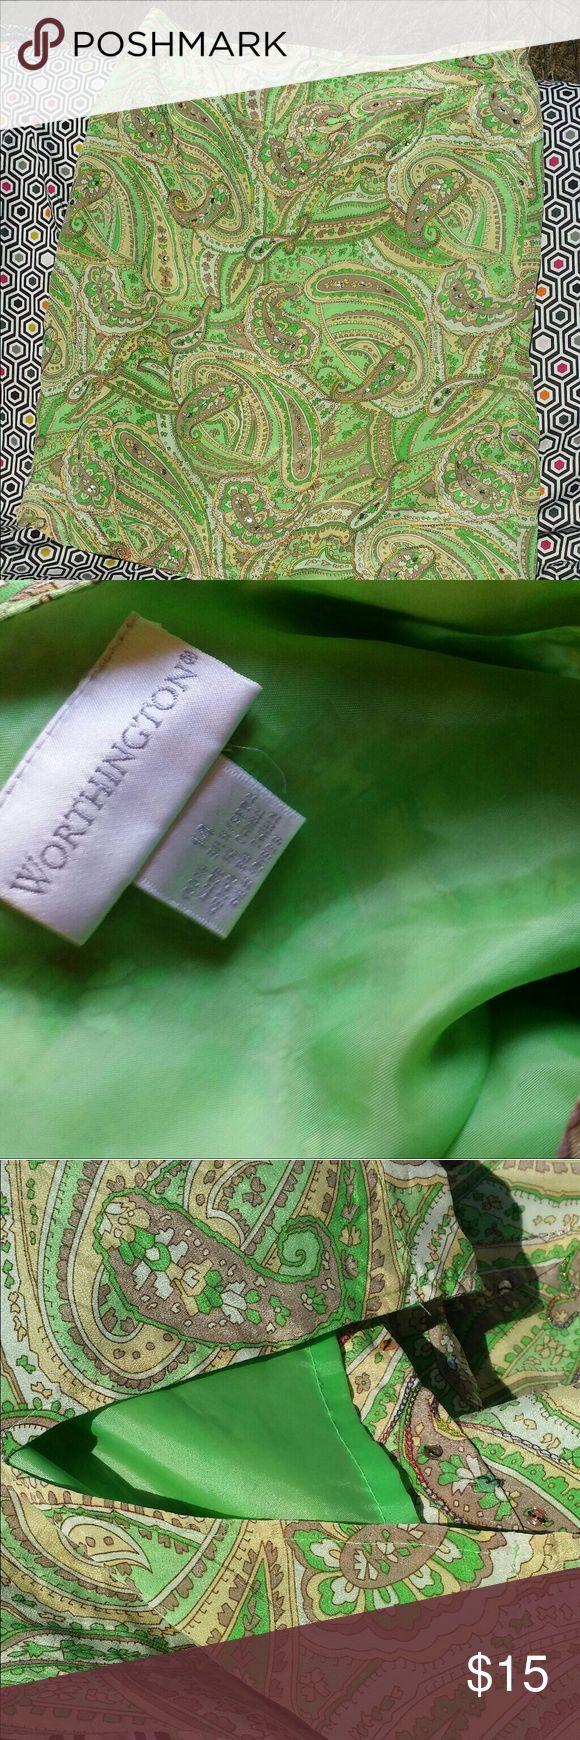 Paisley spring green mini skirt Fun paisley skirt by Worthington size 12.  Greens and cream wity sequin details. Worthington Skirts Mini